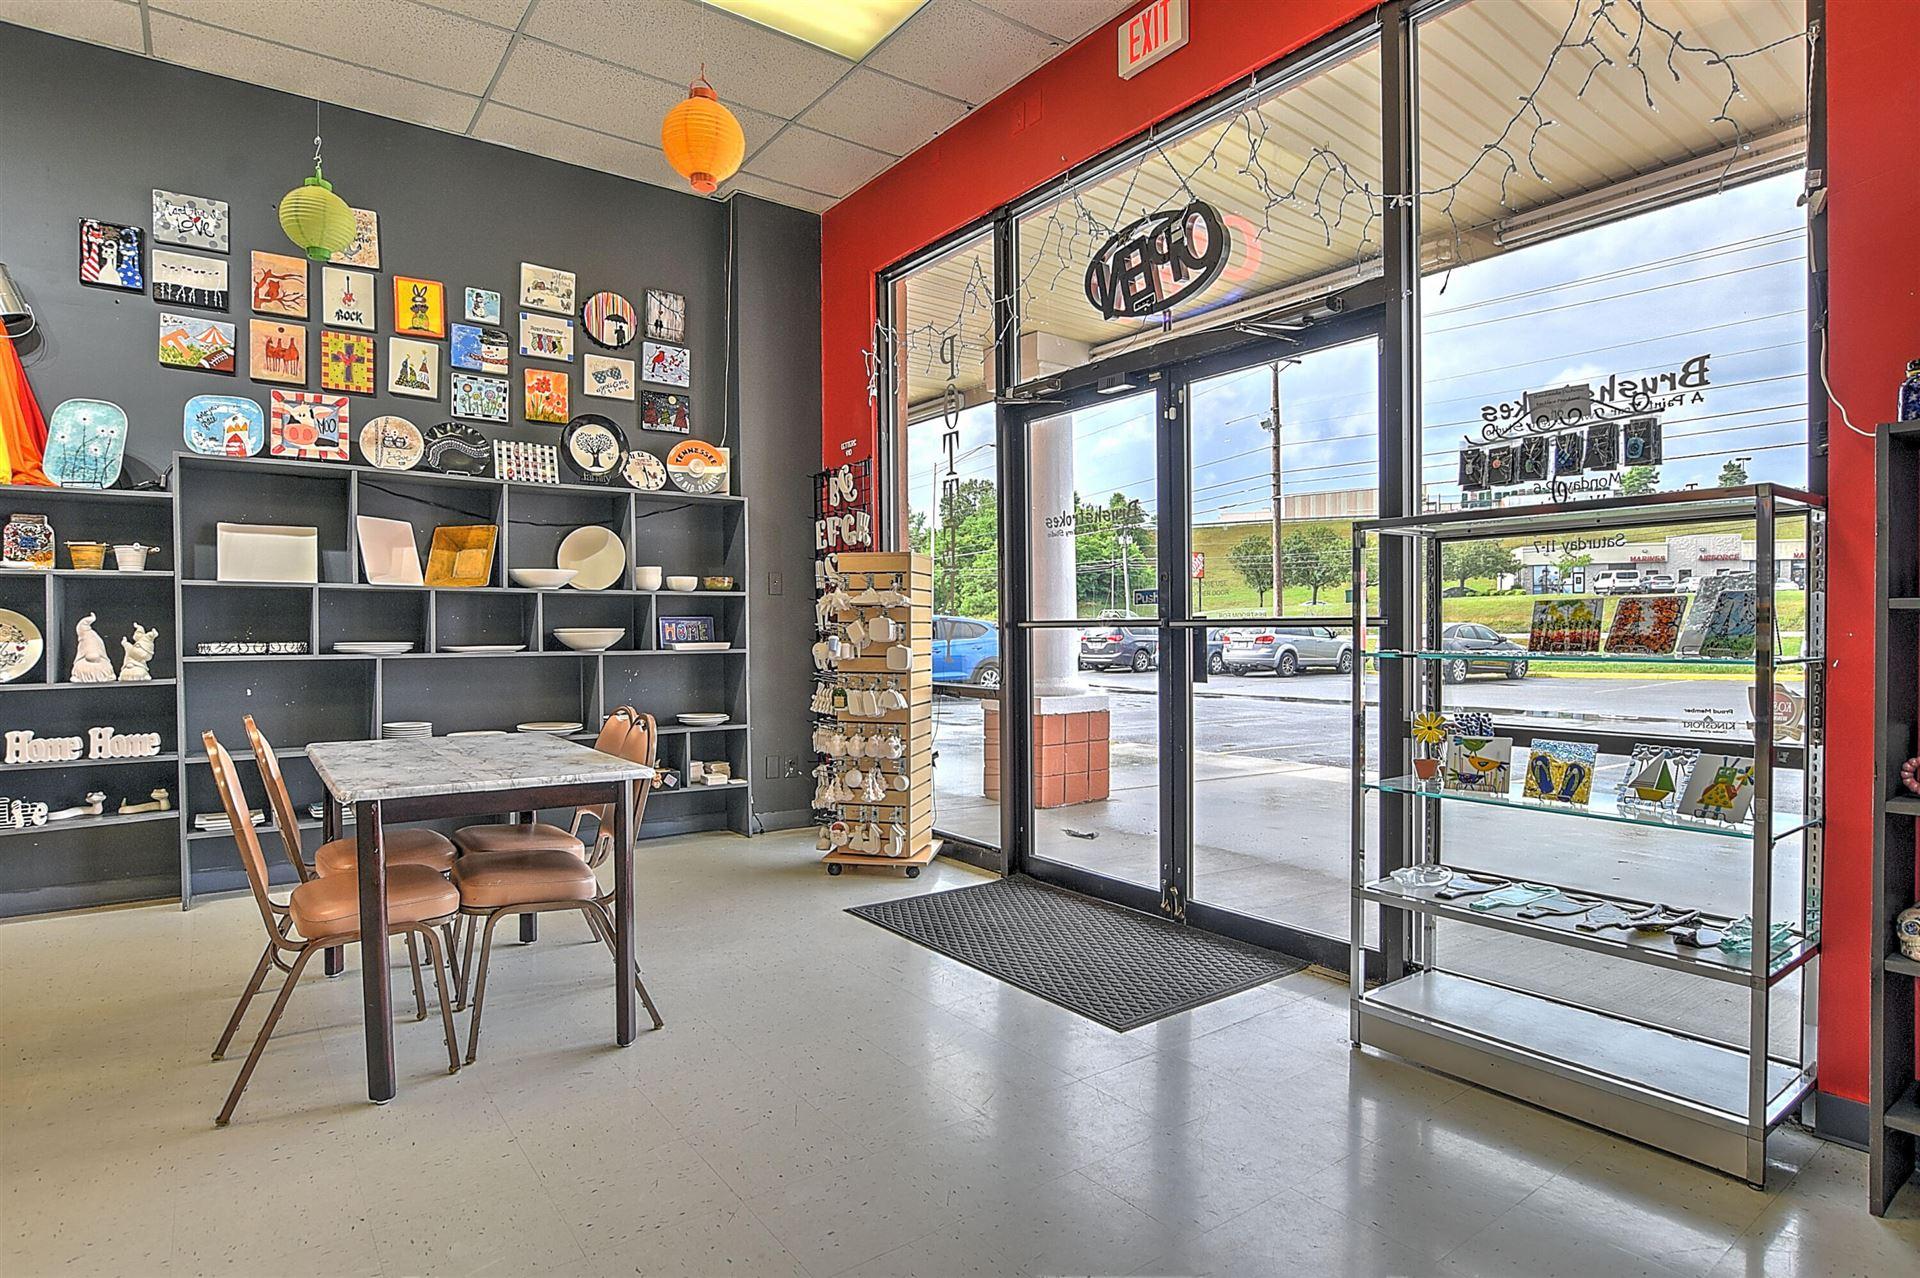 Photo of 1001 East Stone Drive, Kingsport, TN 37660 (MLS # 9923770)